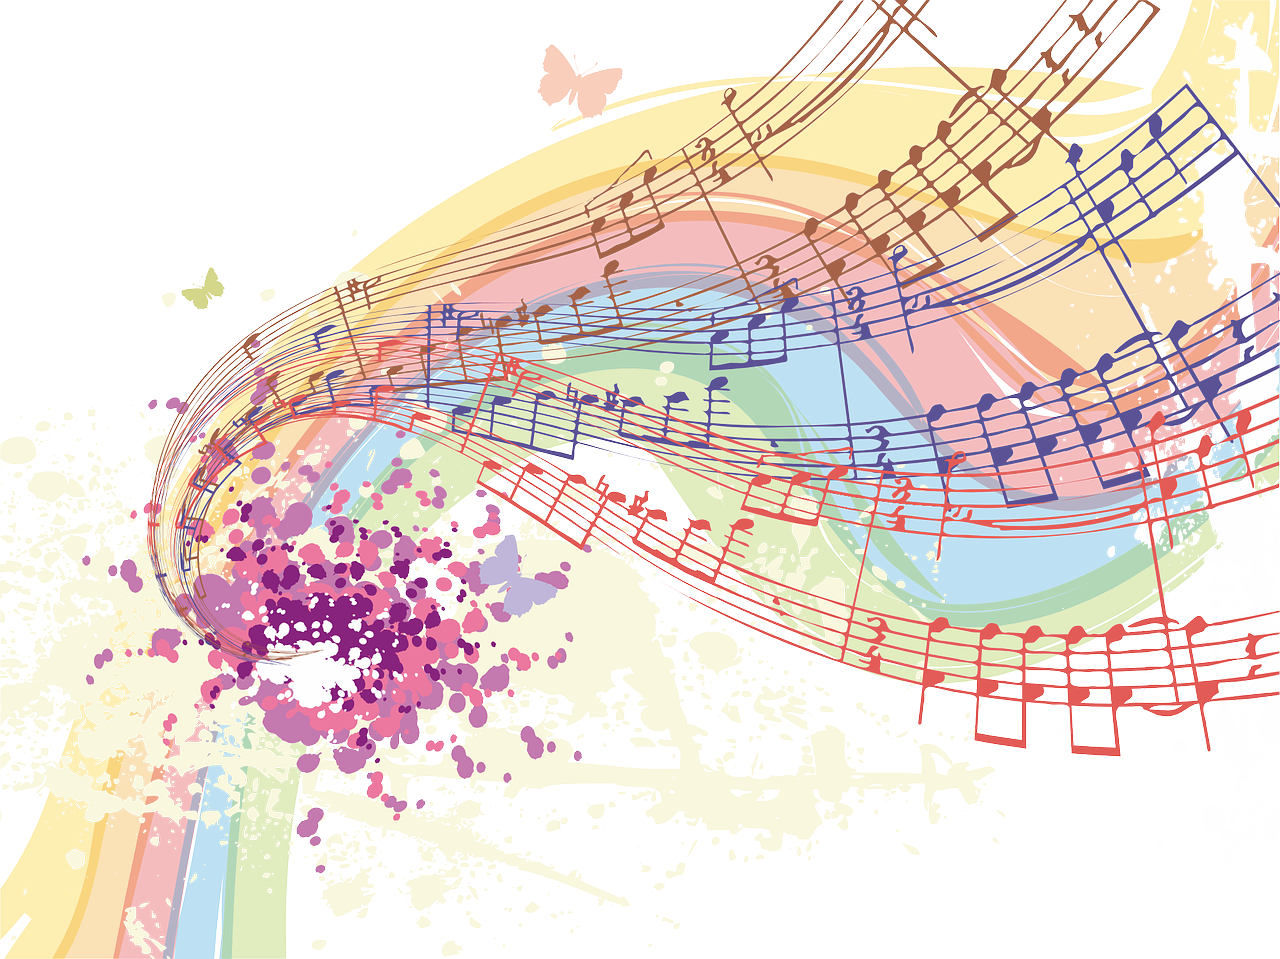 music is an internetional language